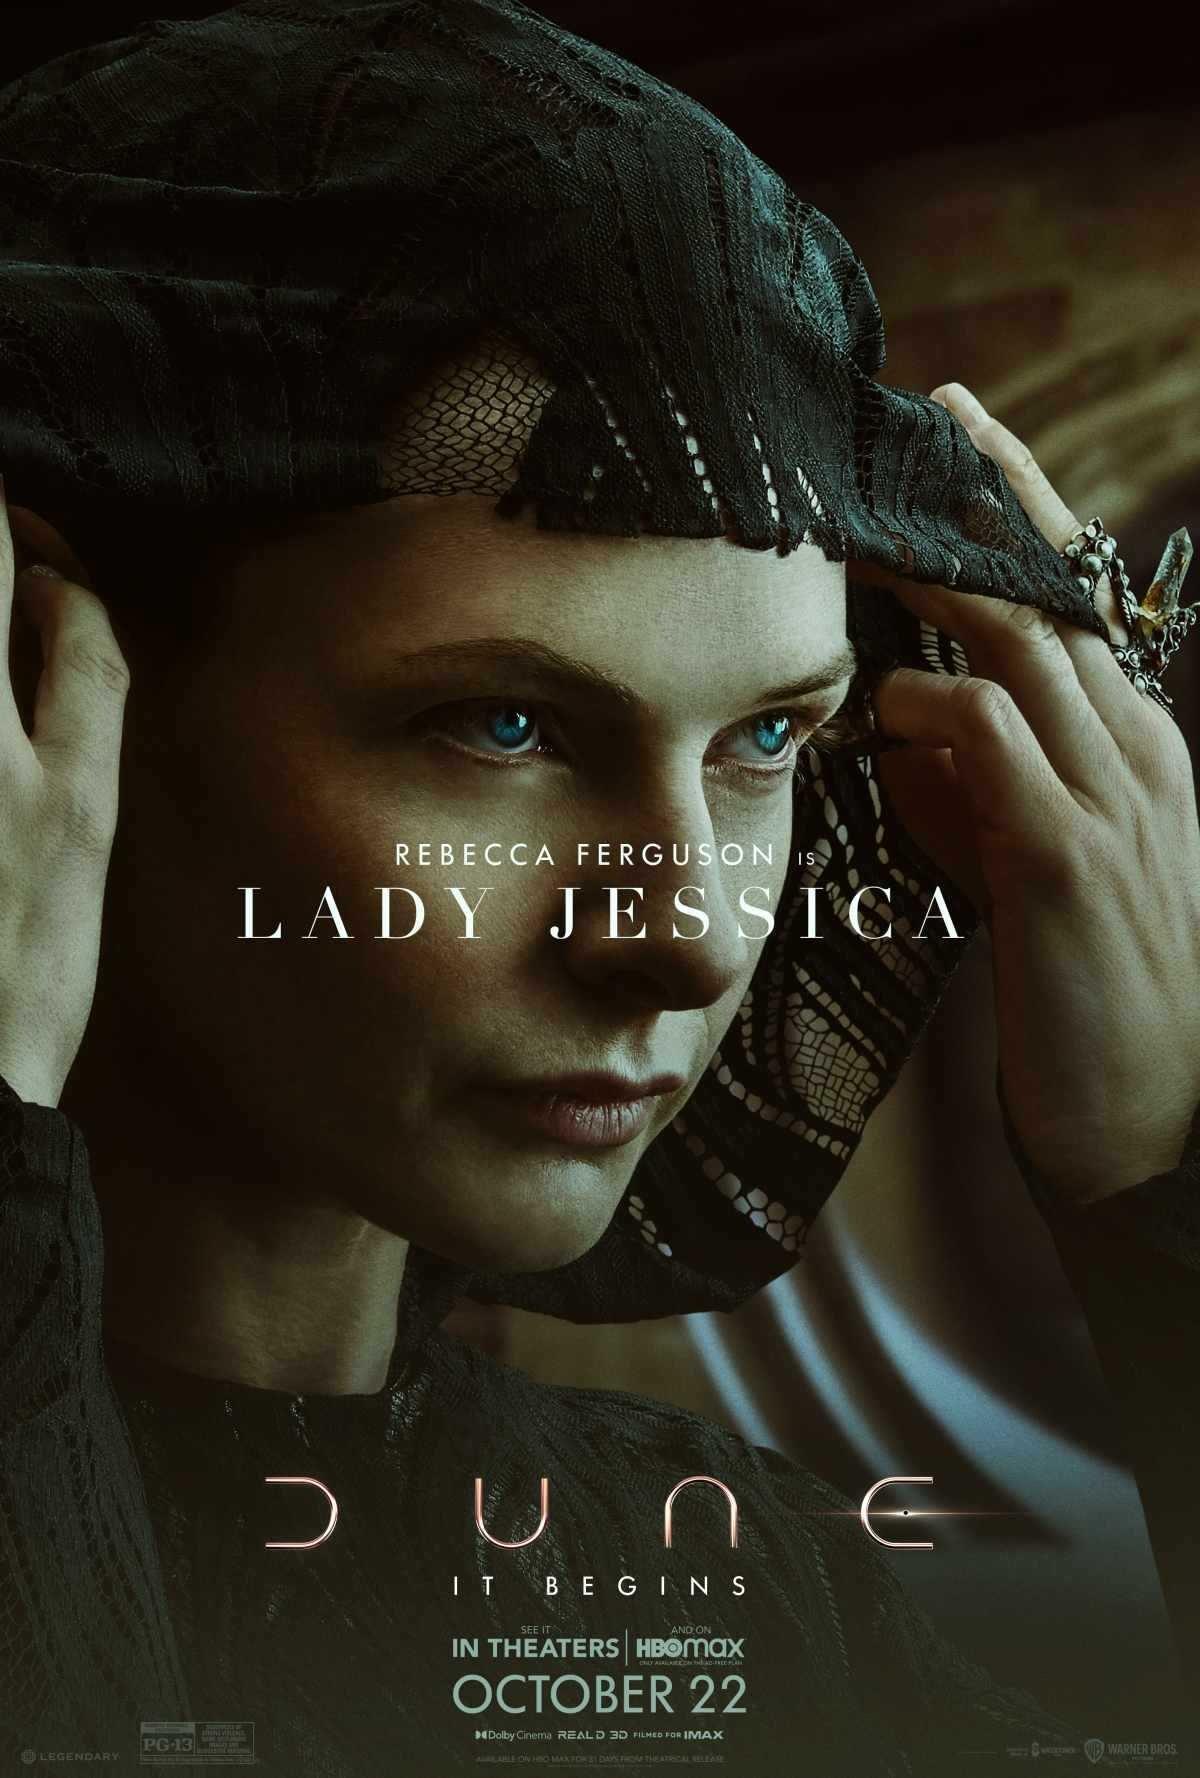 Rebecca Ferguson as Lady Jessica in 'Dune'